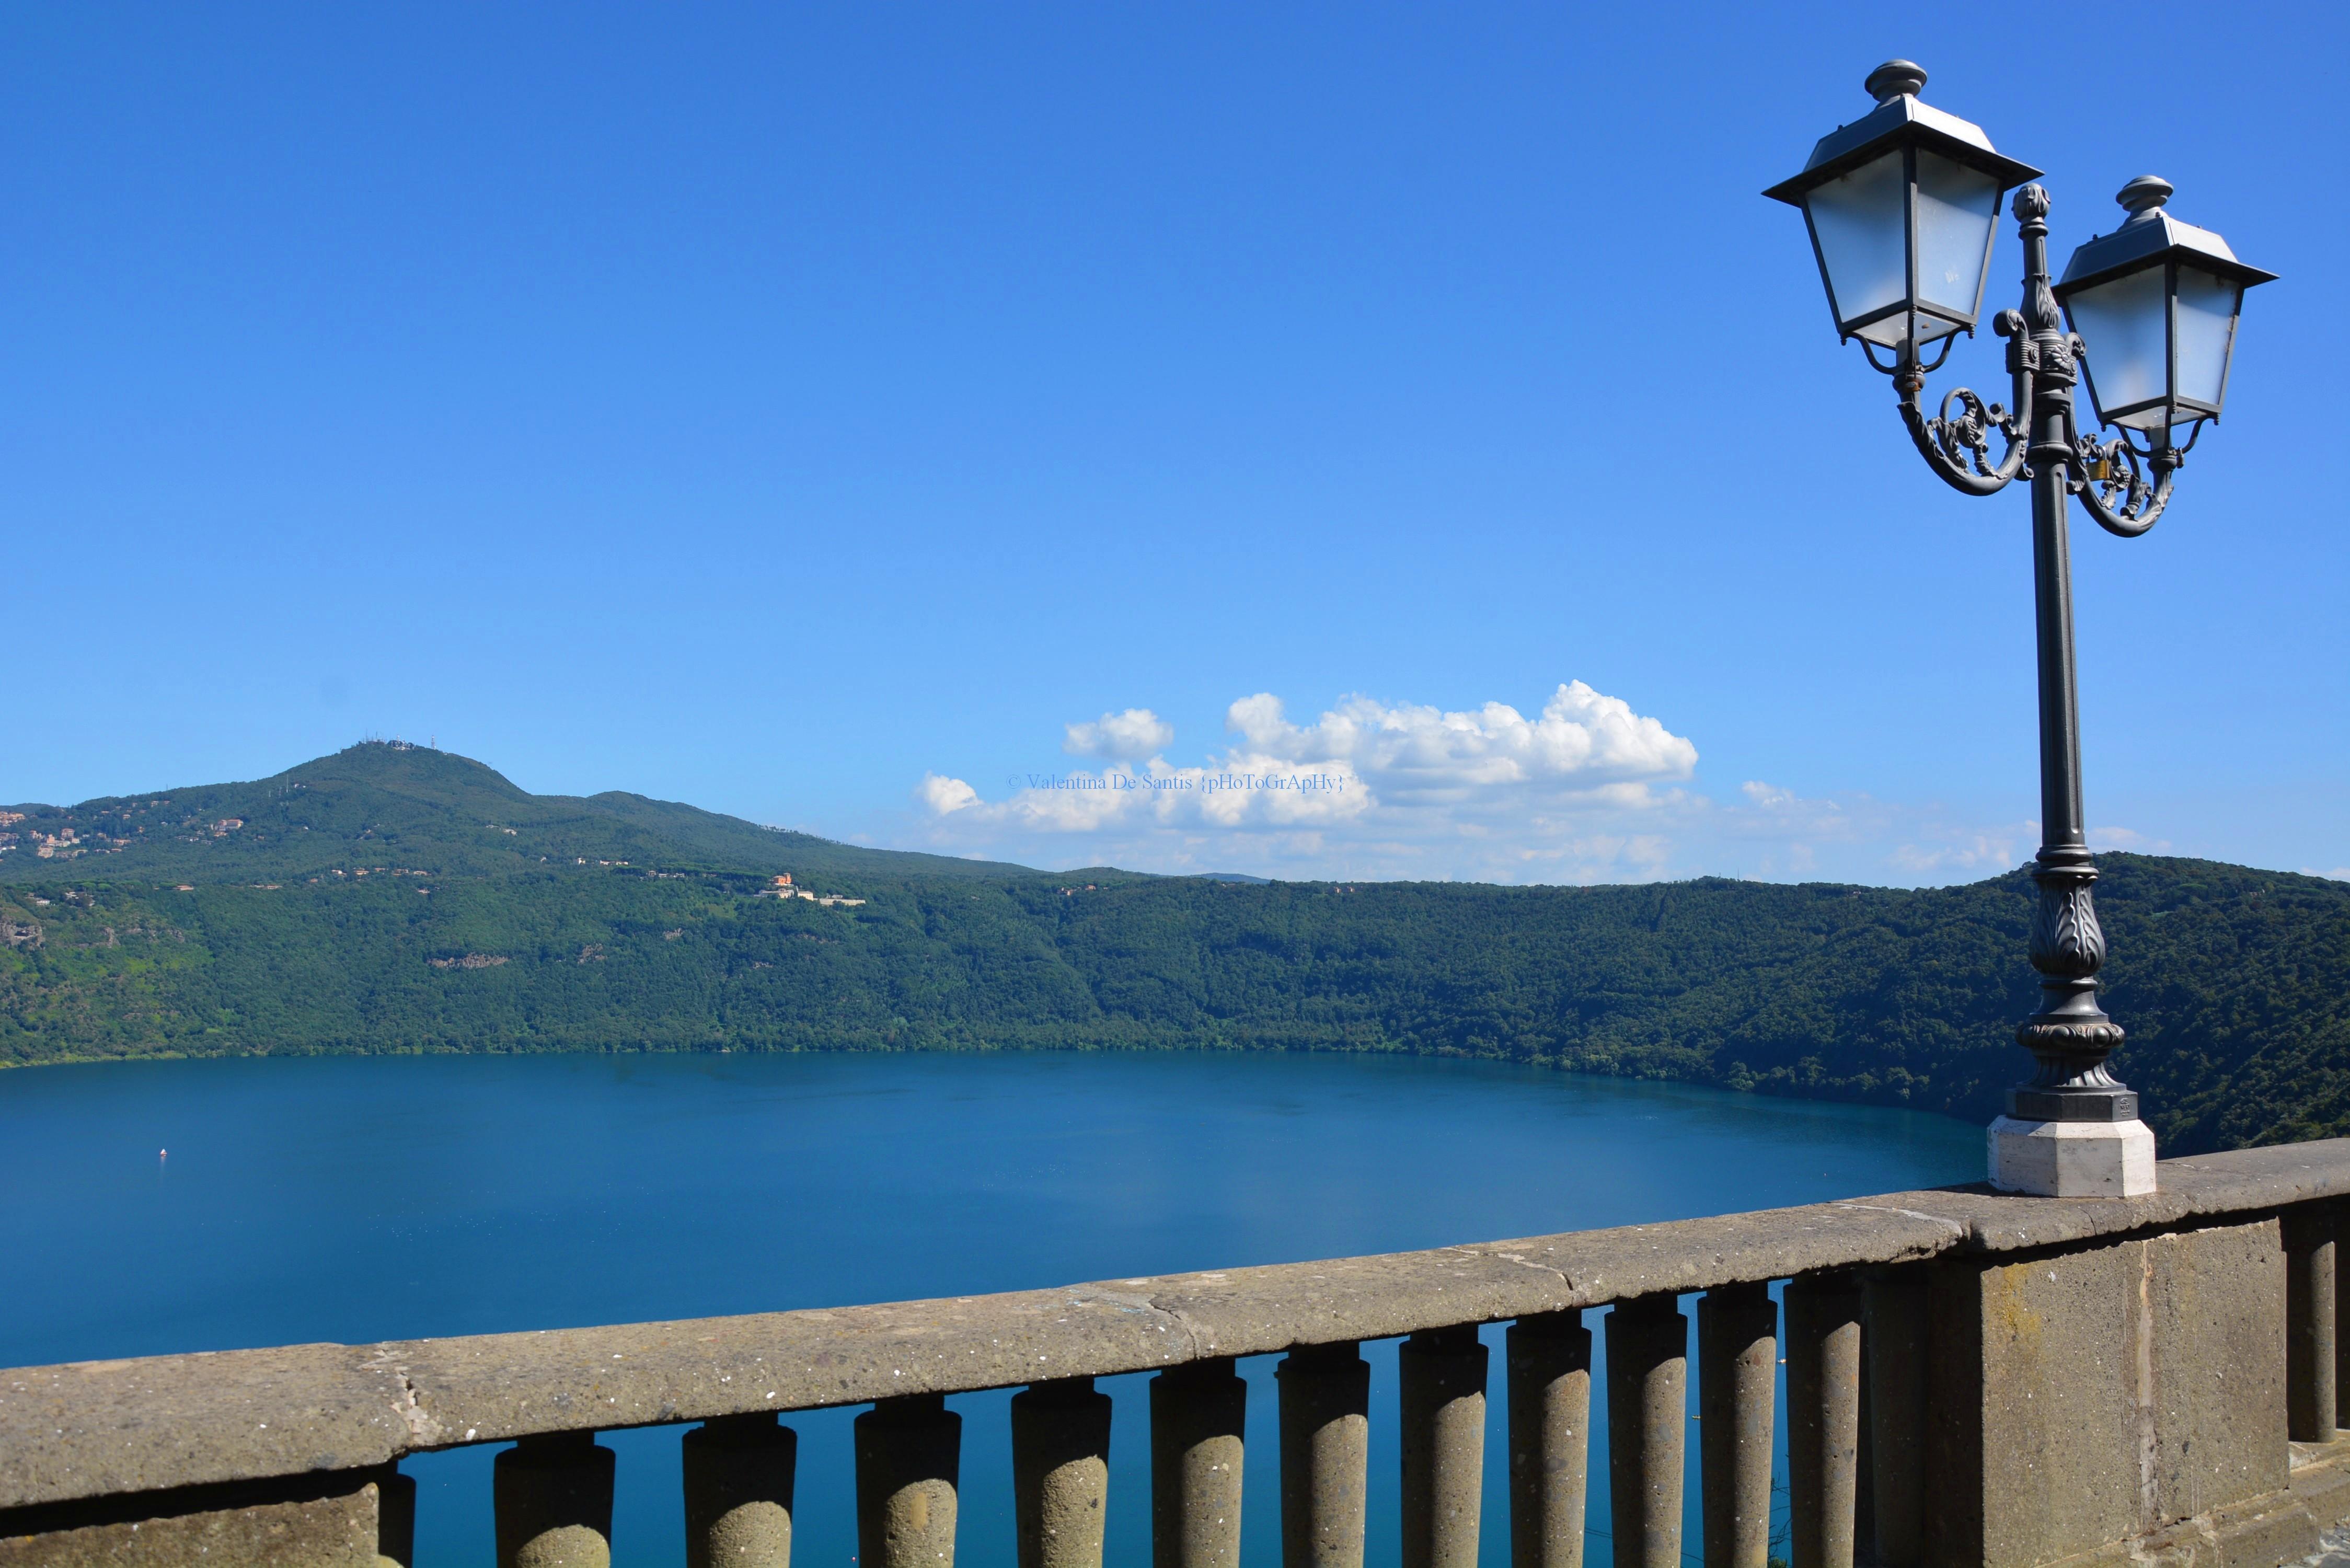 View of Monte Cavo, Lake Albano